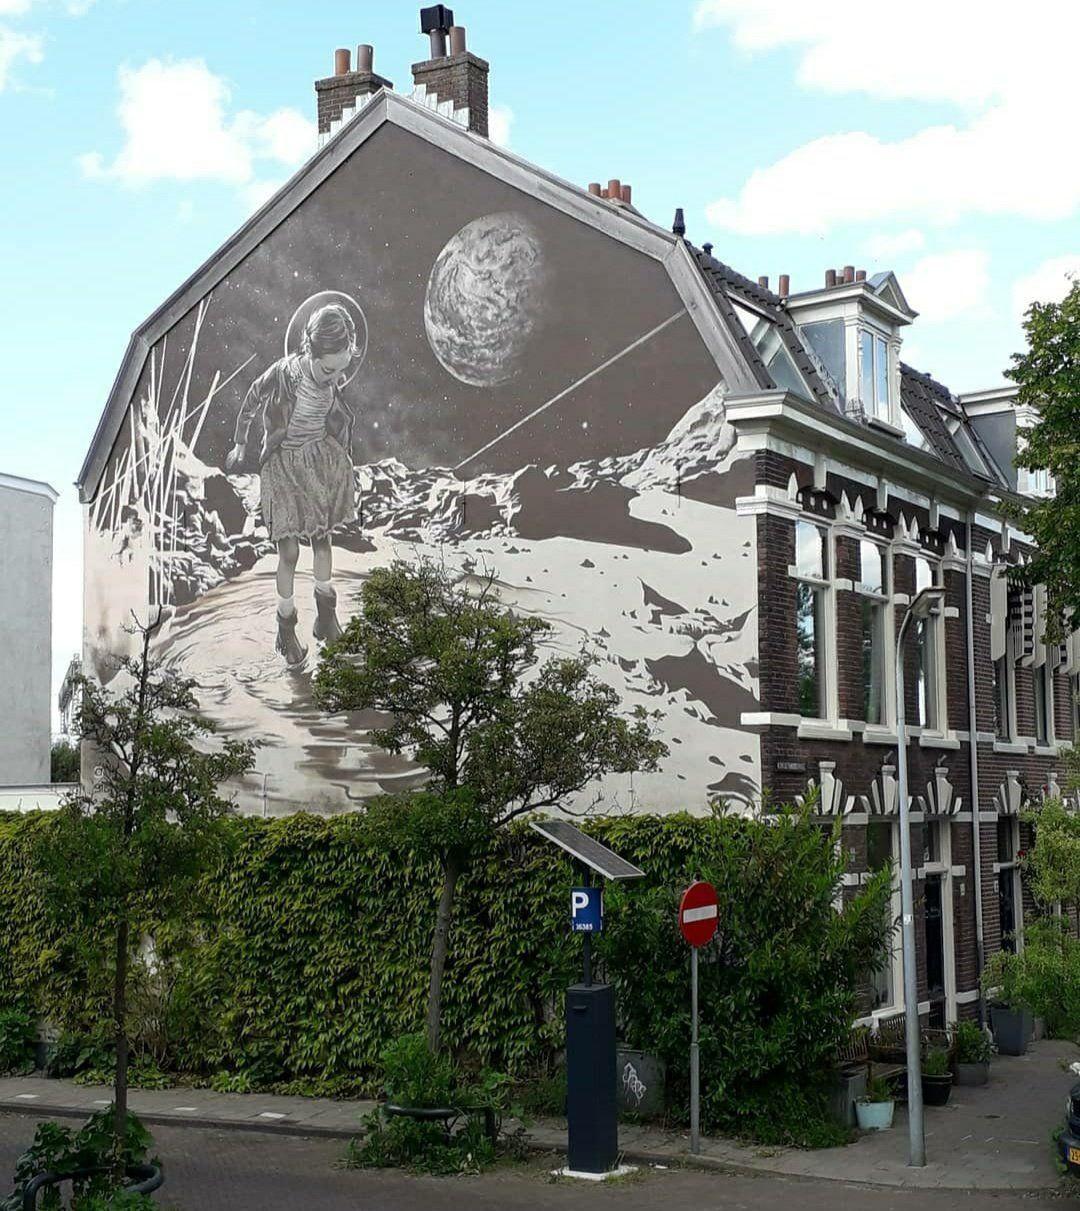 Sidney Waerts-Haarlem-2020-1